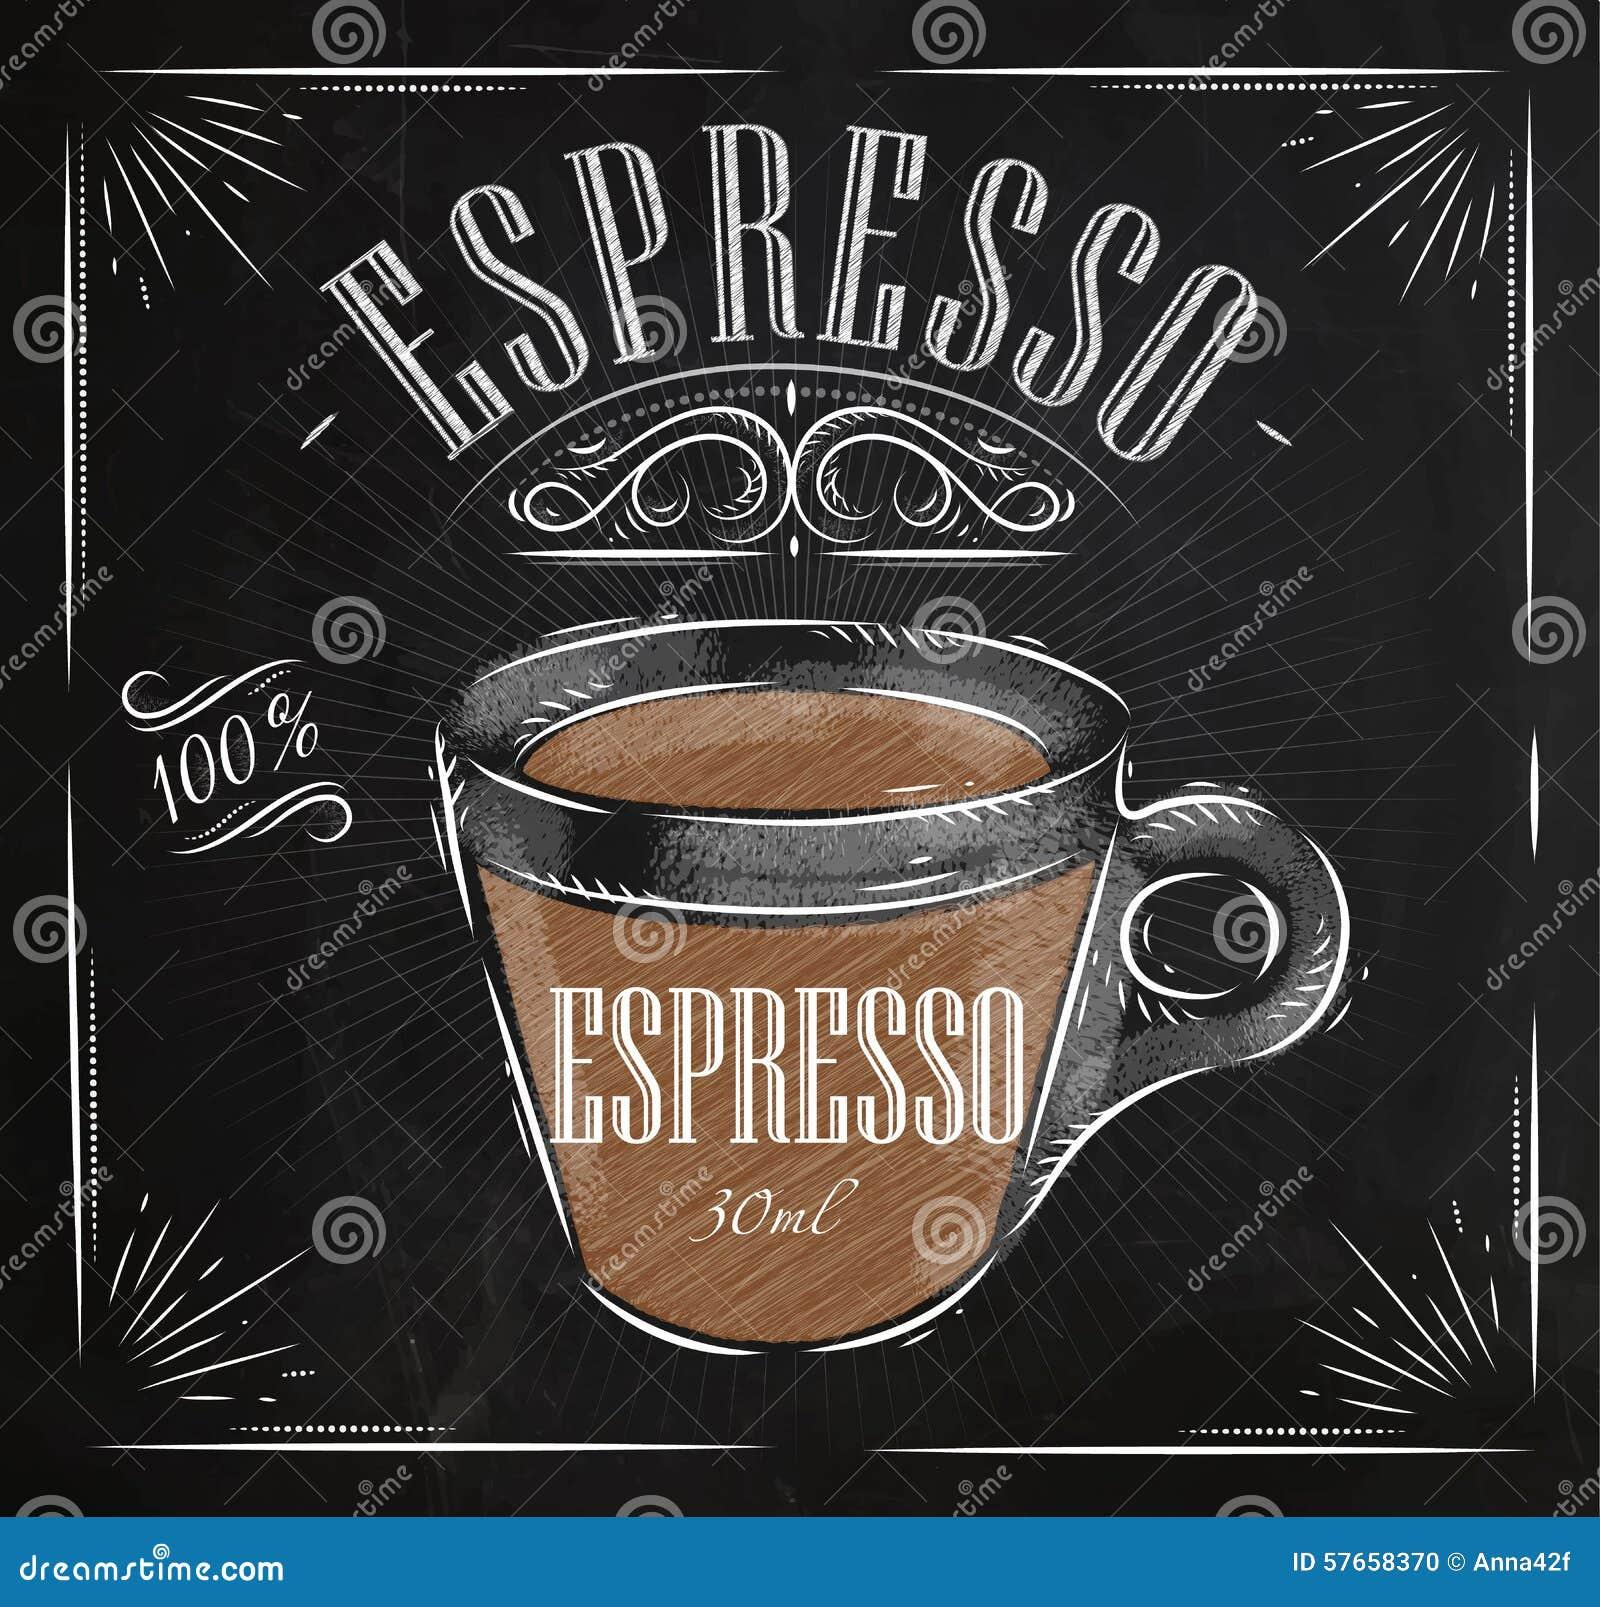 poster espresso chalk stock illustration image 57658370 cup of coffee clipart free cup of coffee clipart black and white